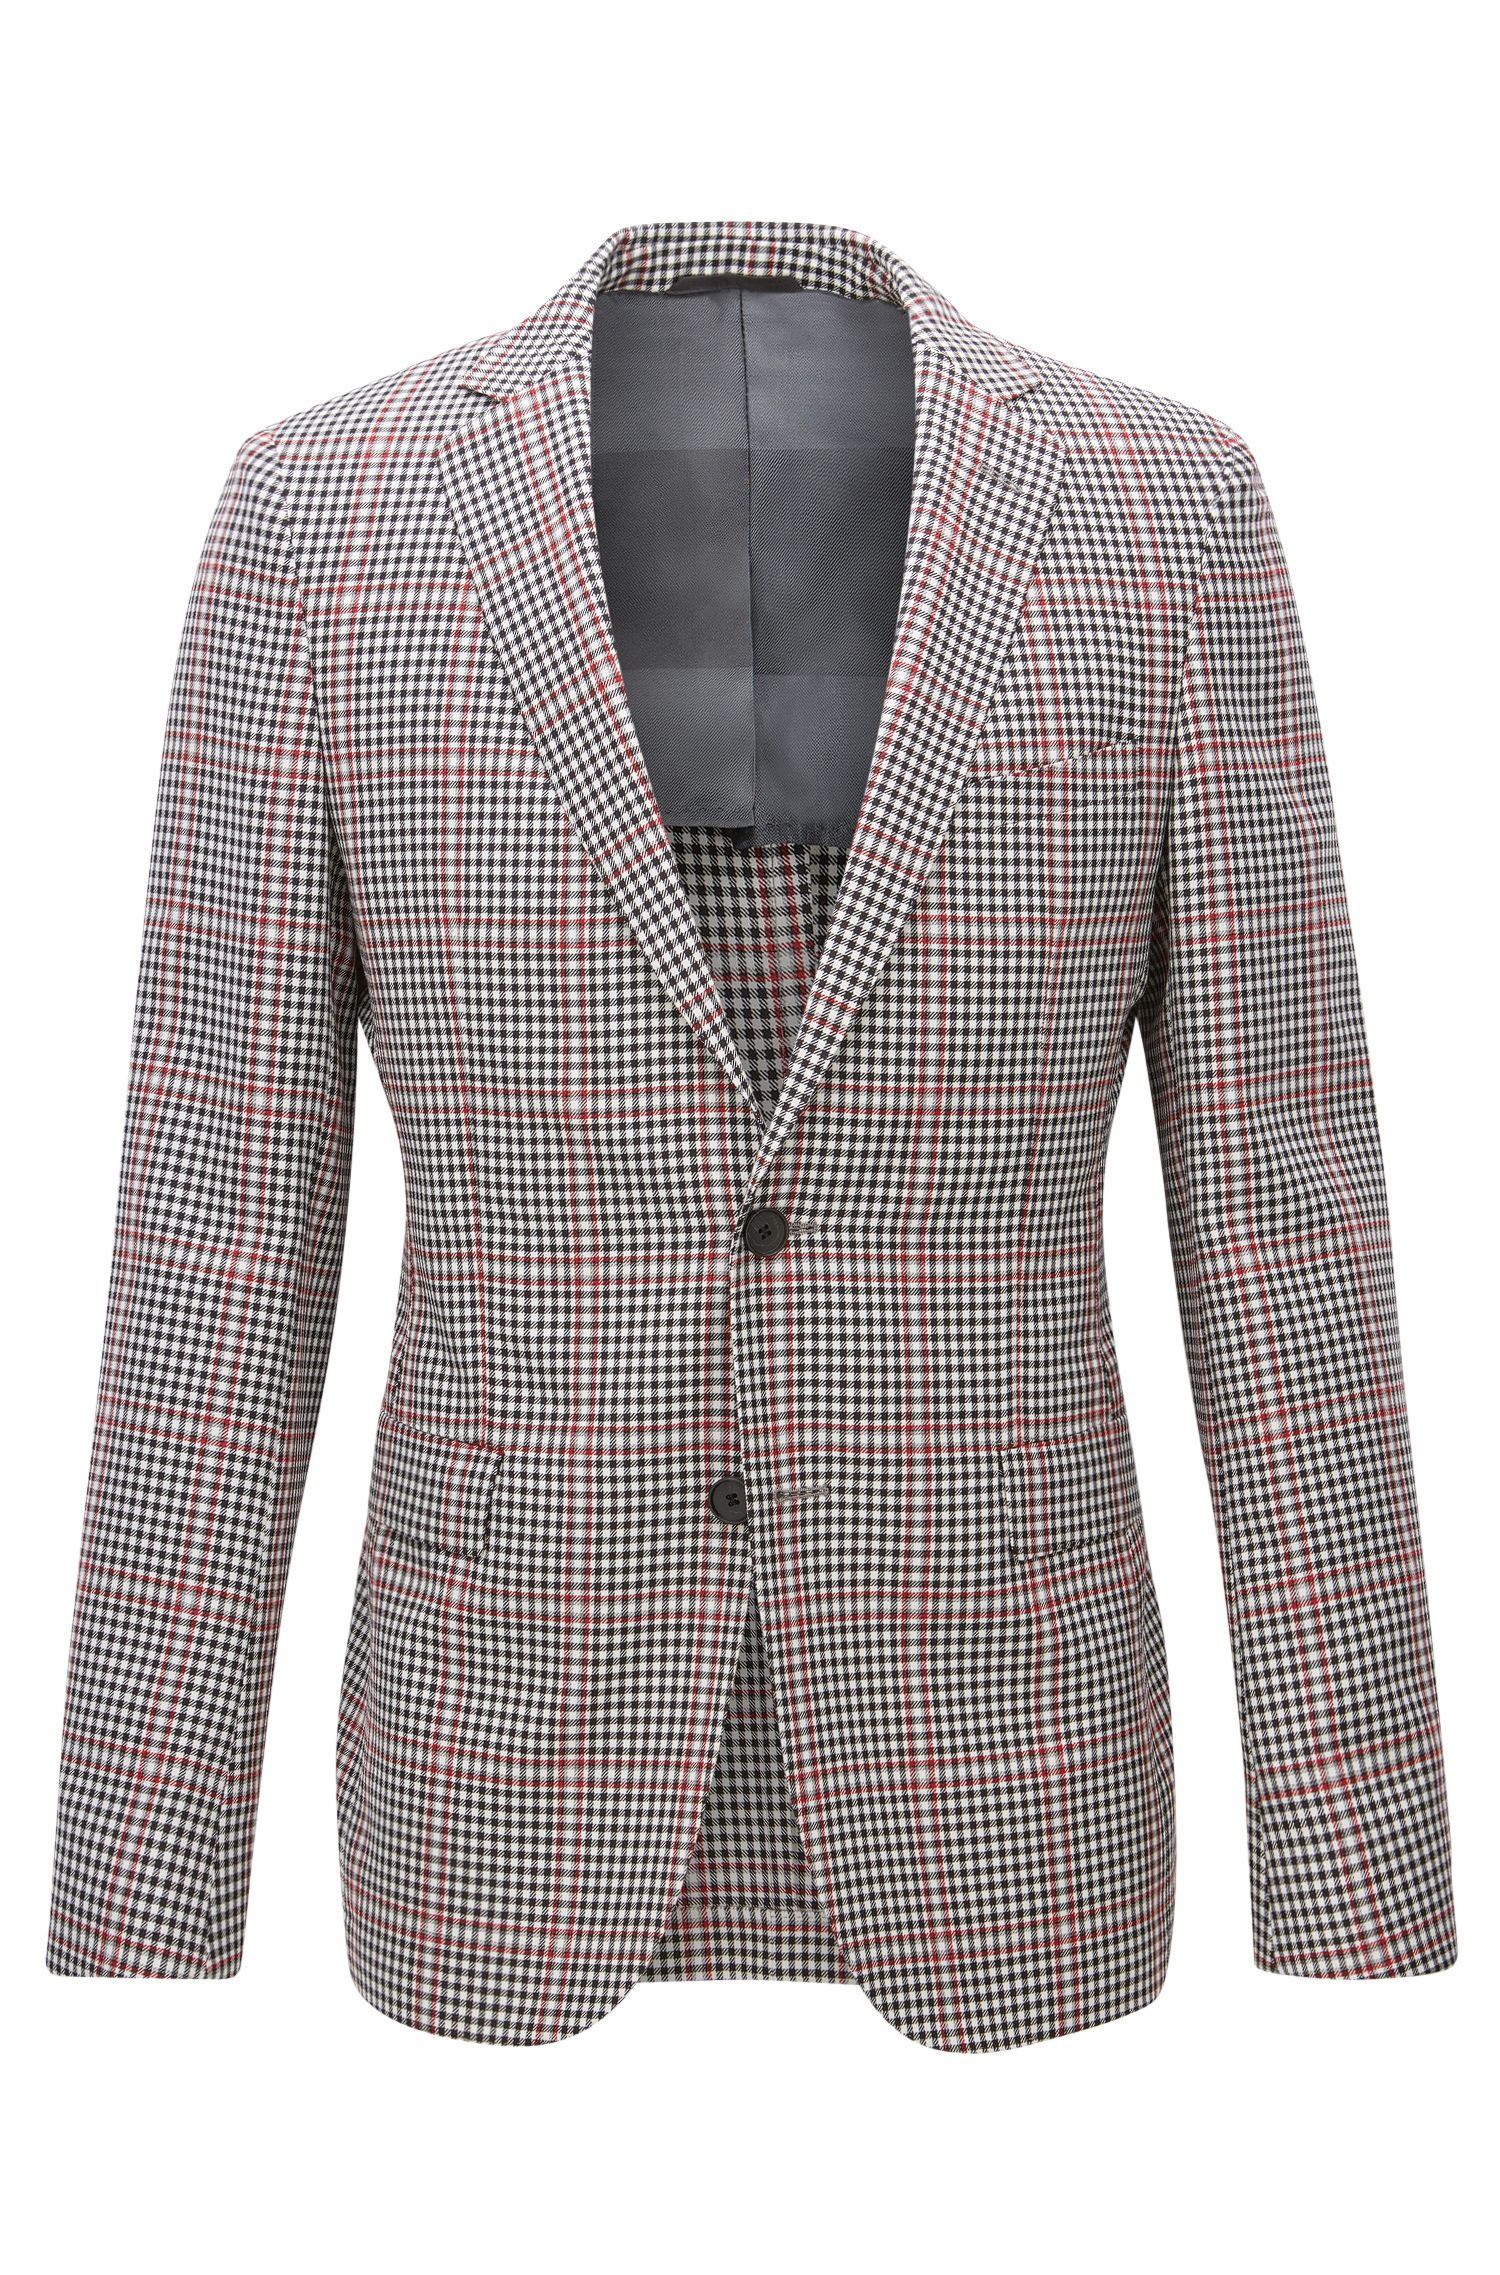 Windowpane Virgin Wool Sport Coat, Extra Slim Fit | Roan